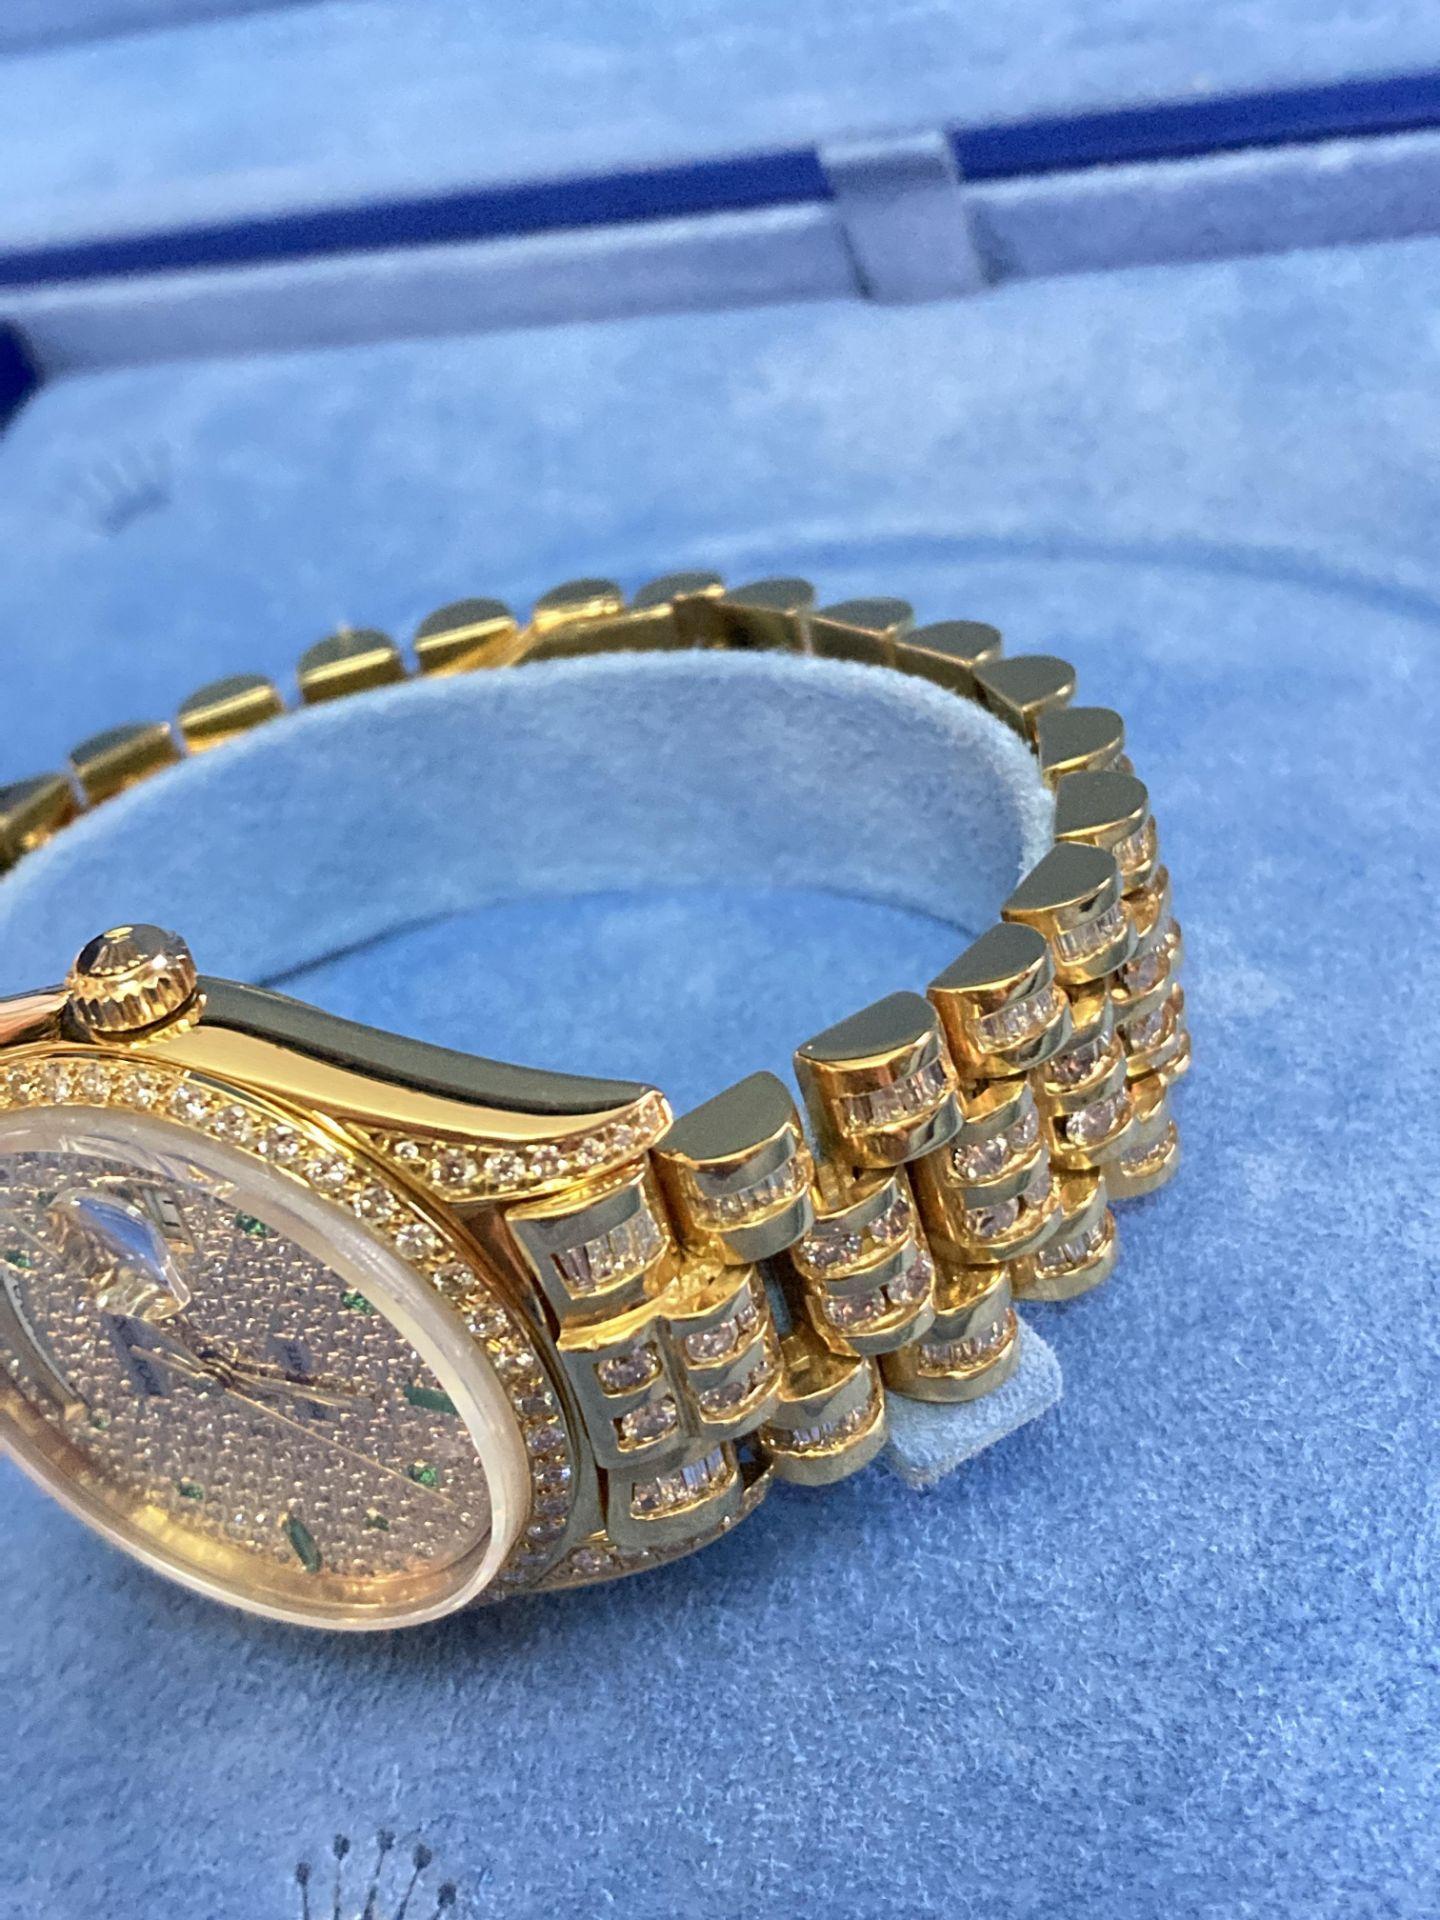 GENTS 36mm ROLEX DAYDATE YELLOW GOLD DIAMOND WATCH - Image 7 of 21